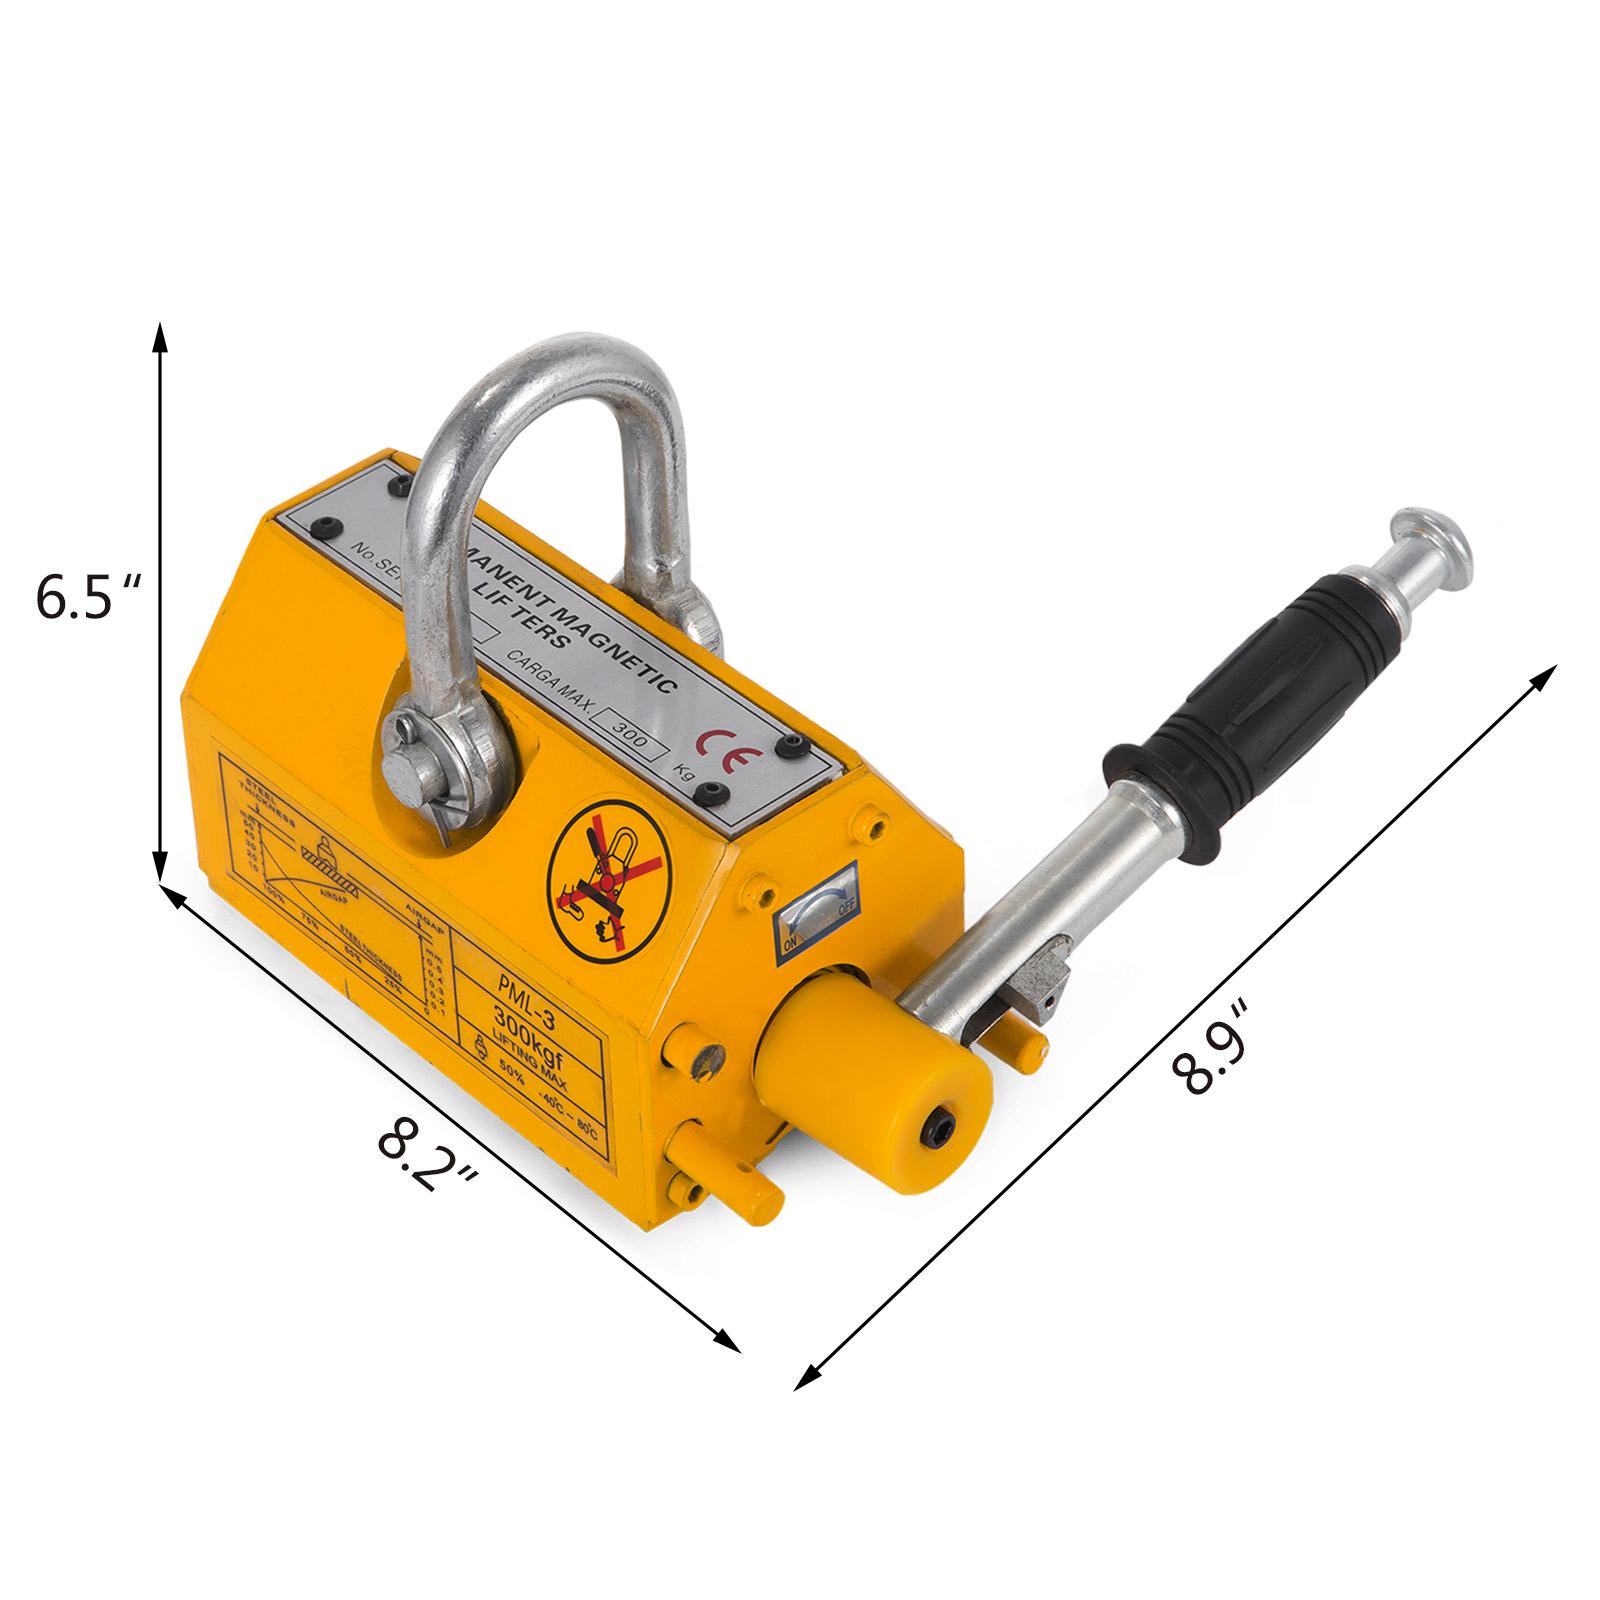 100-300-600-1000KG-Steel-Magnetic-Lifter-Heavy-Duty-Crane-Hoist-Lifting-Magnet miniature 26